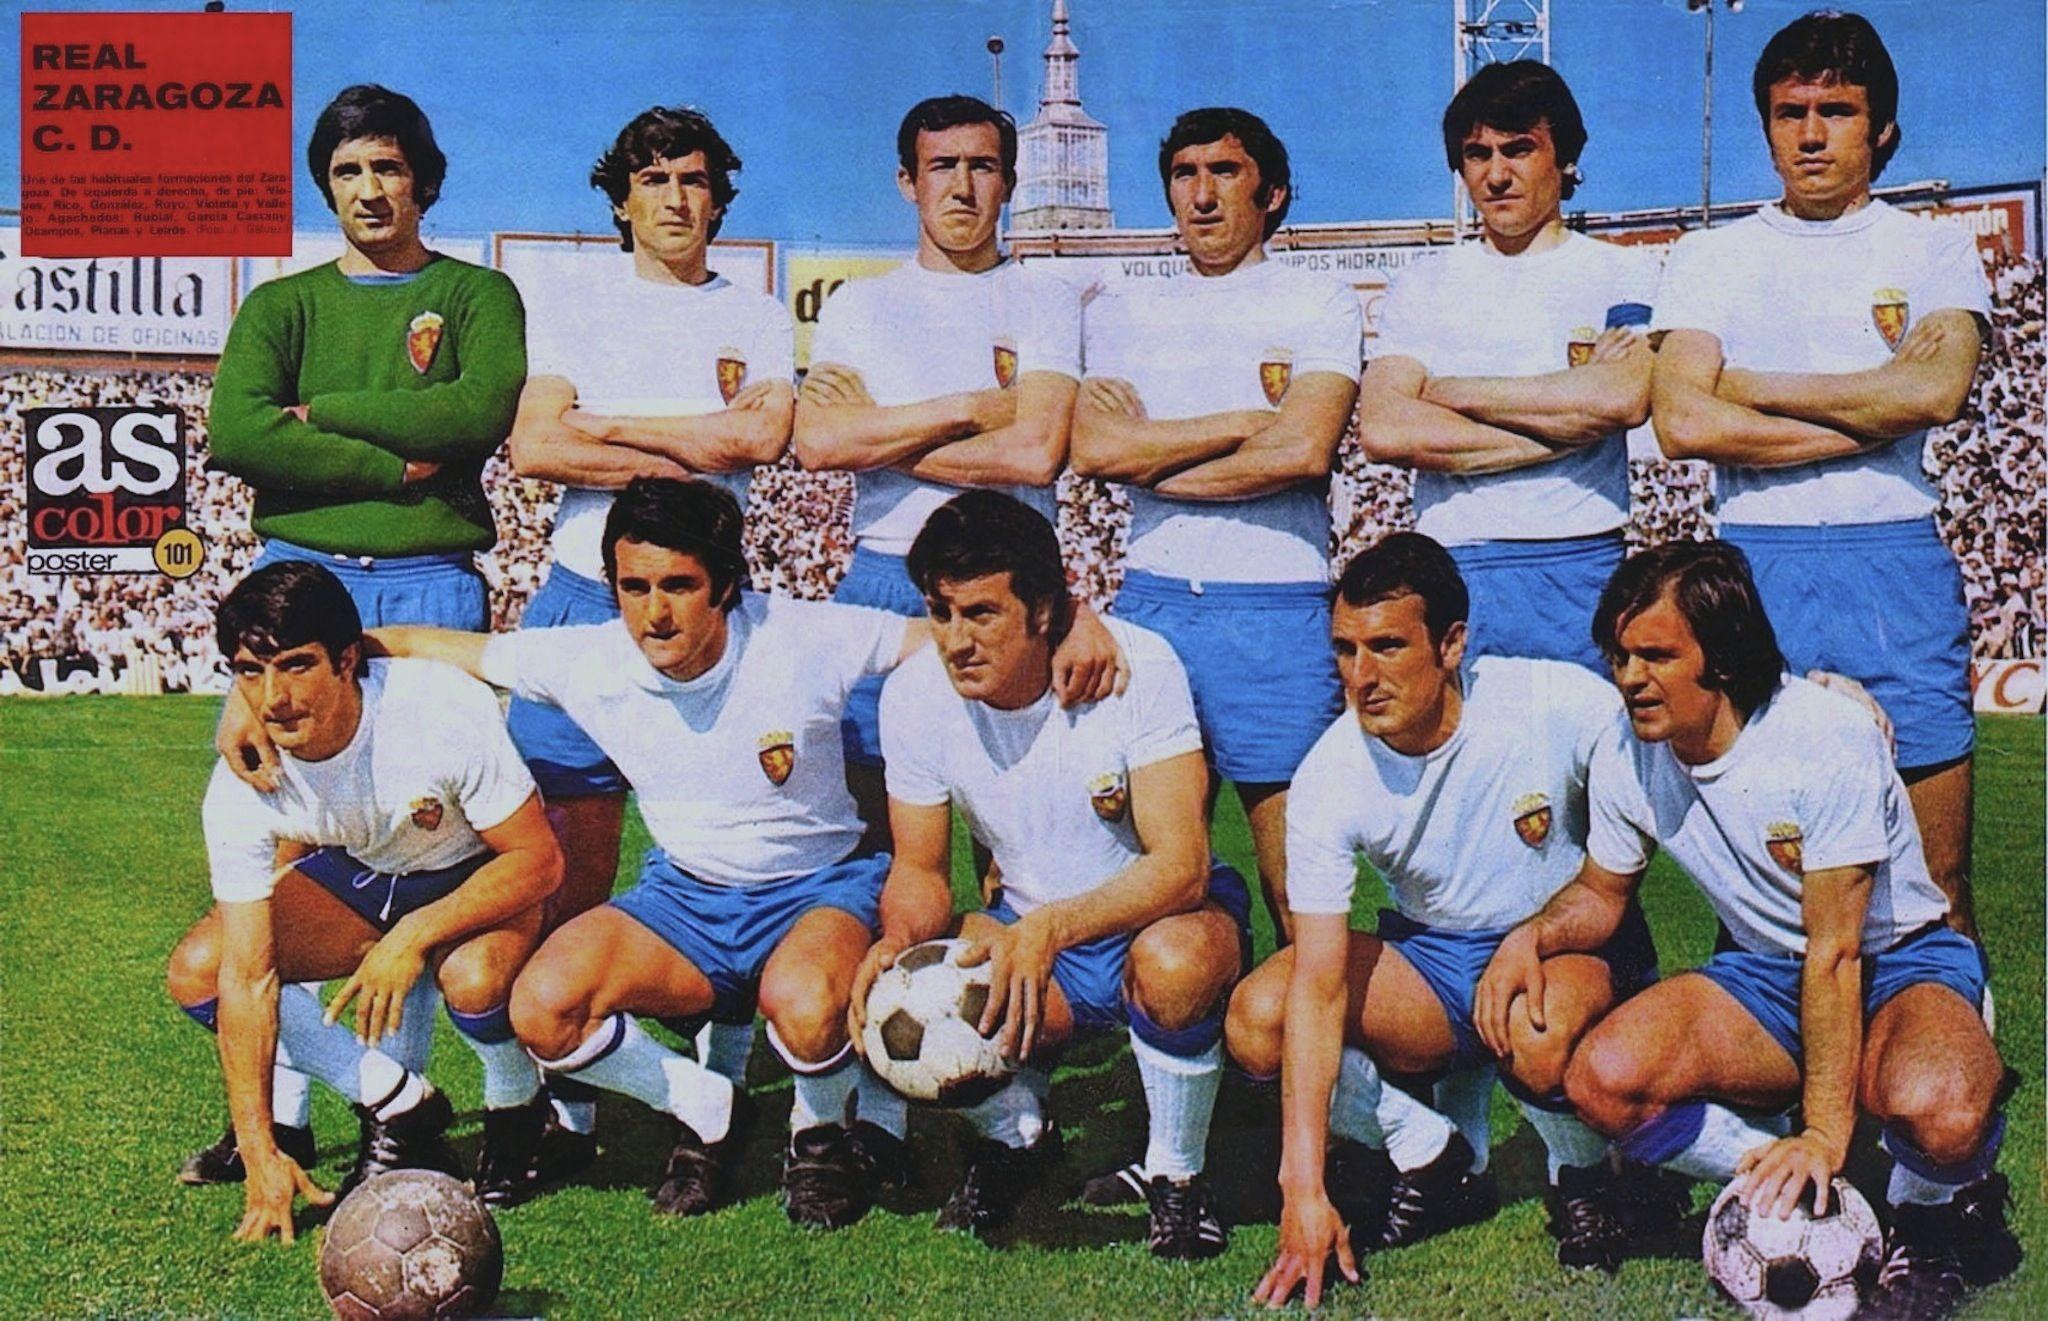 101 - Real Zaragoza Club Deportivo 72-73. - Equipo de ...